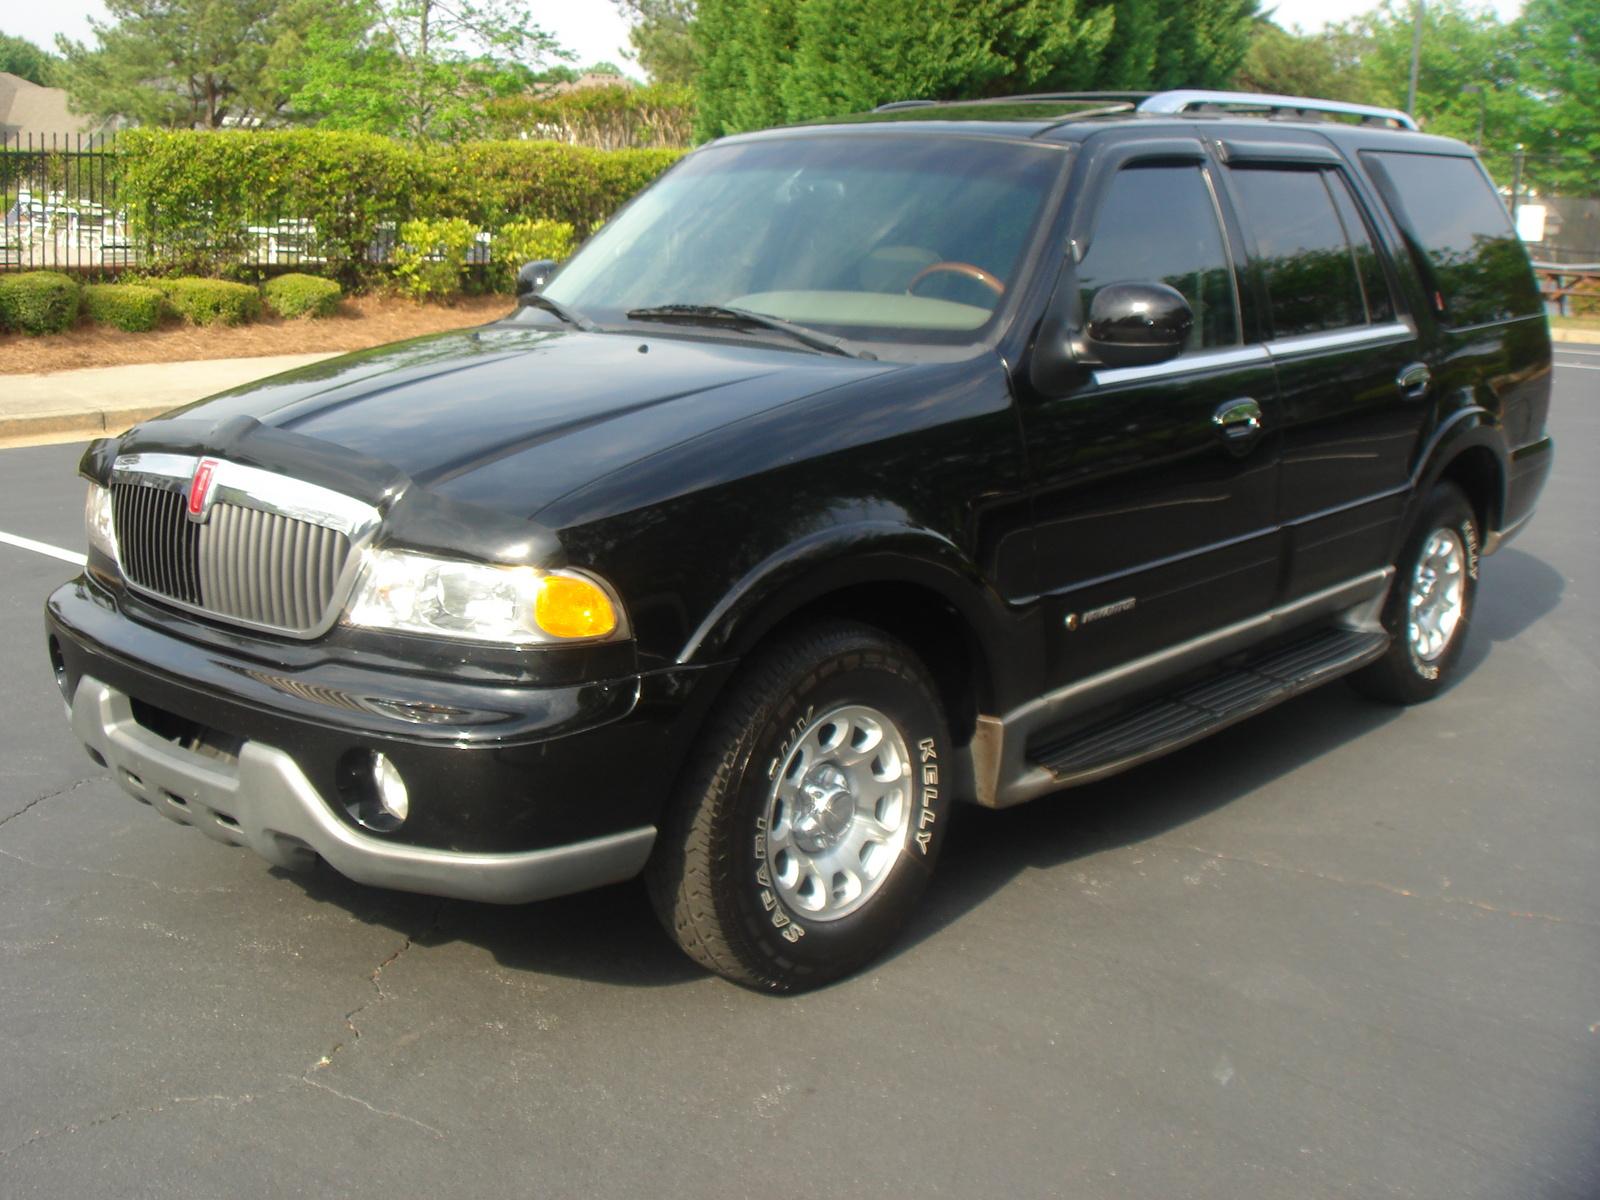 2000 Lincoln Navigator Exterior Pictures Cargurus